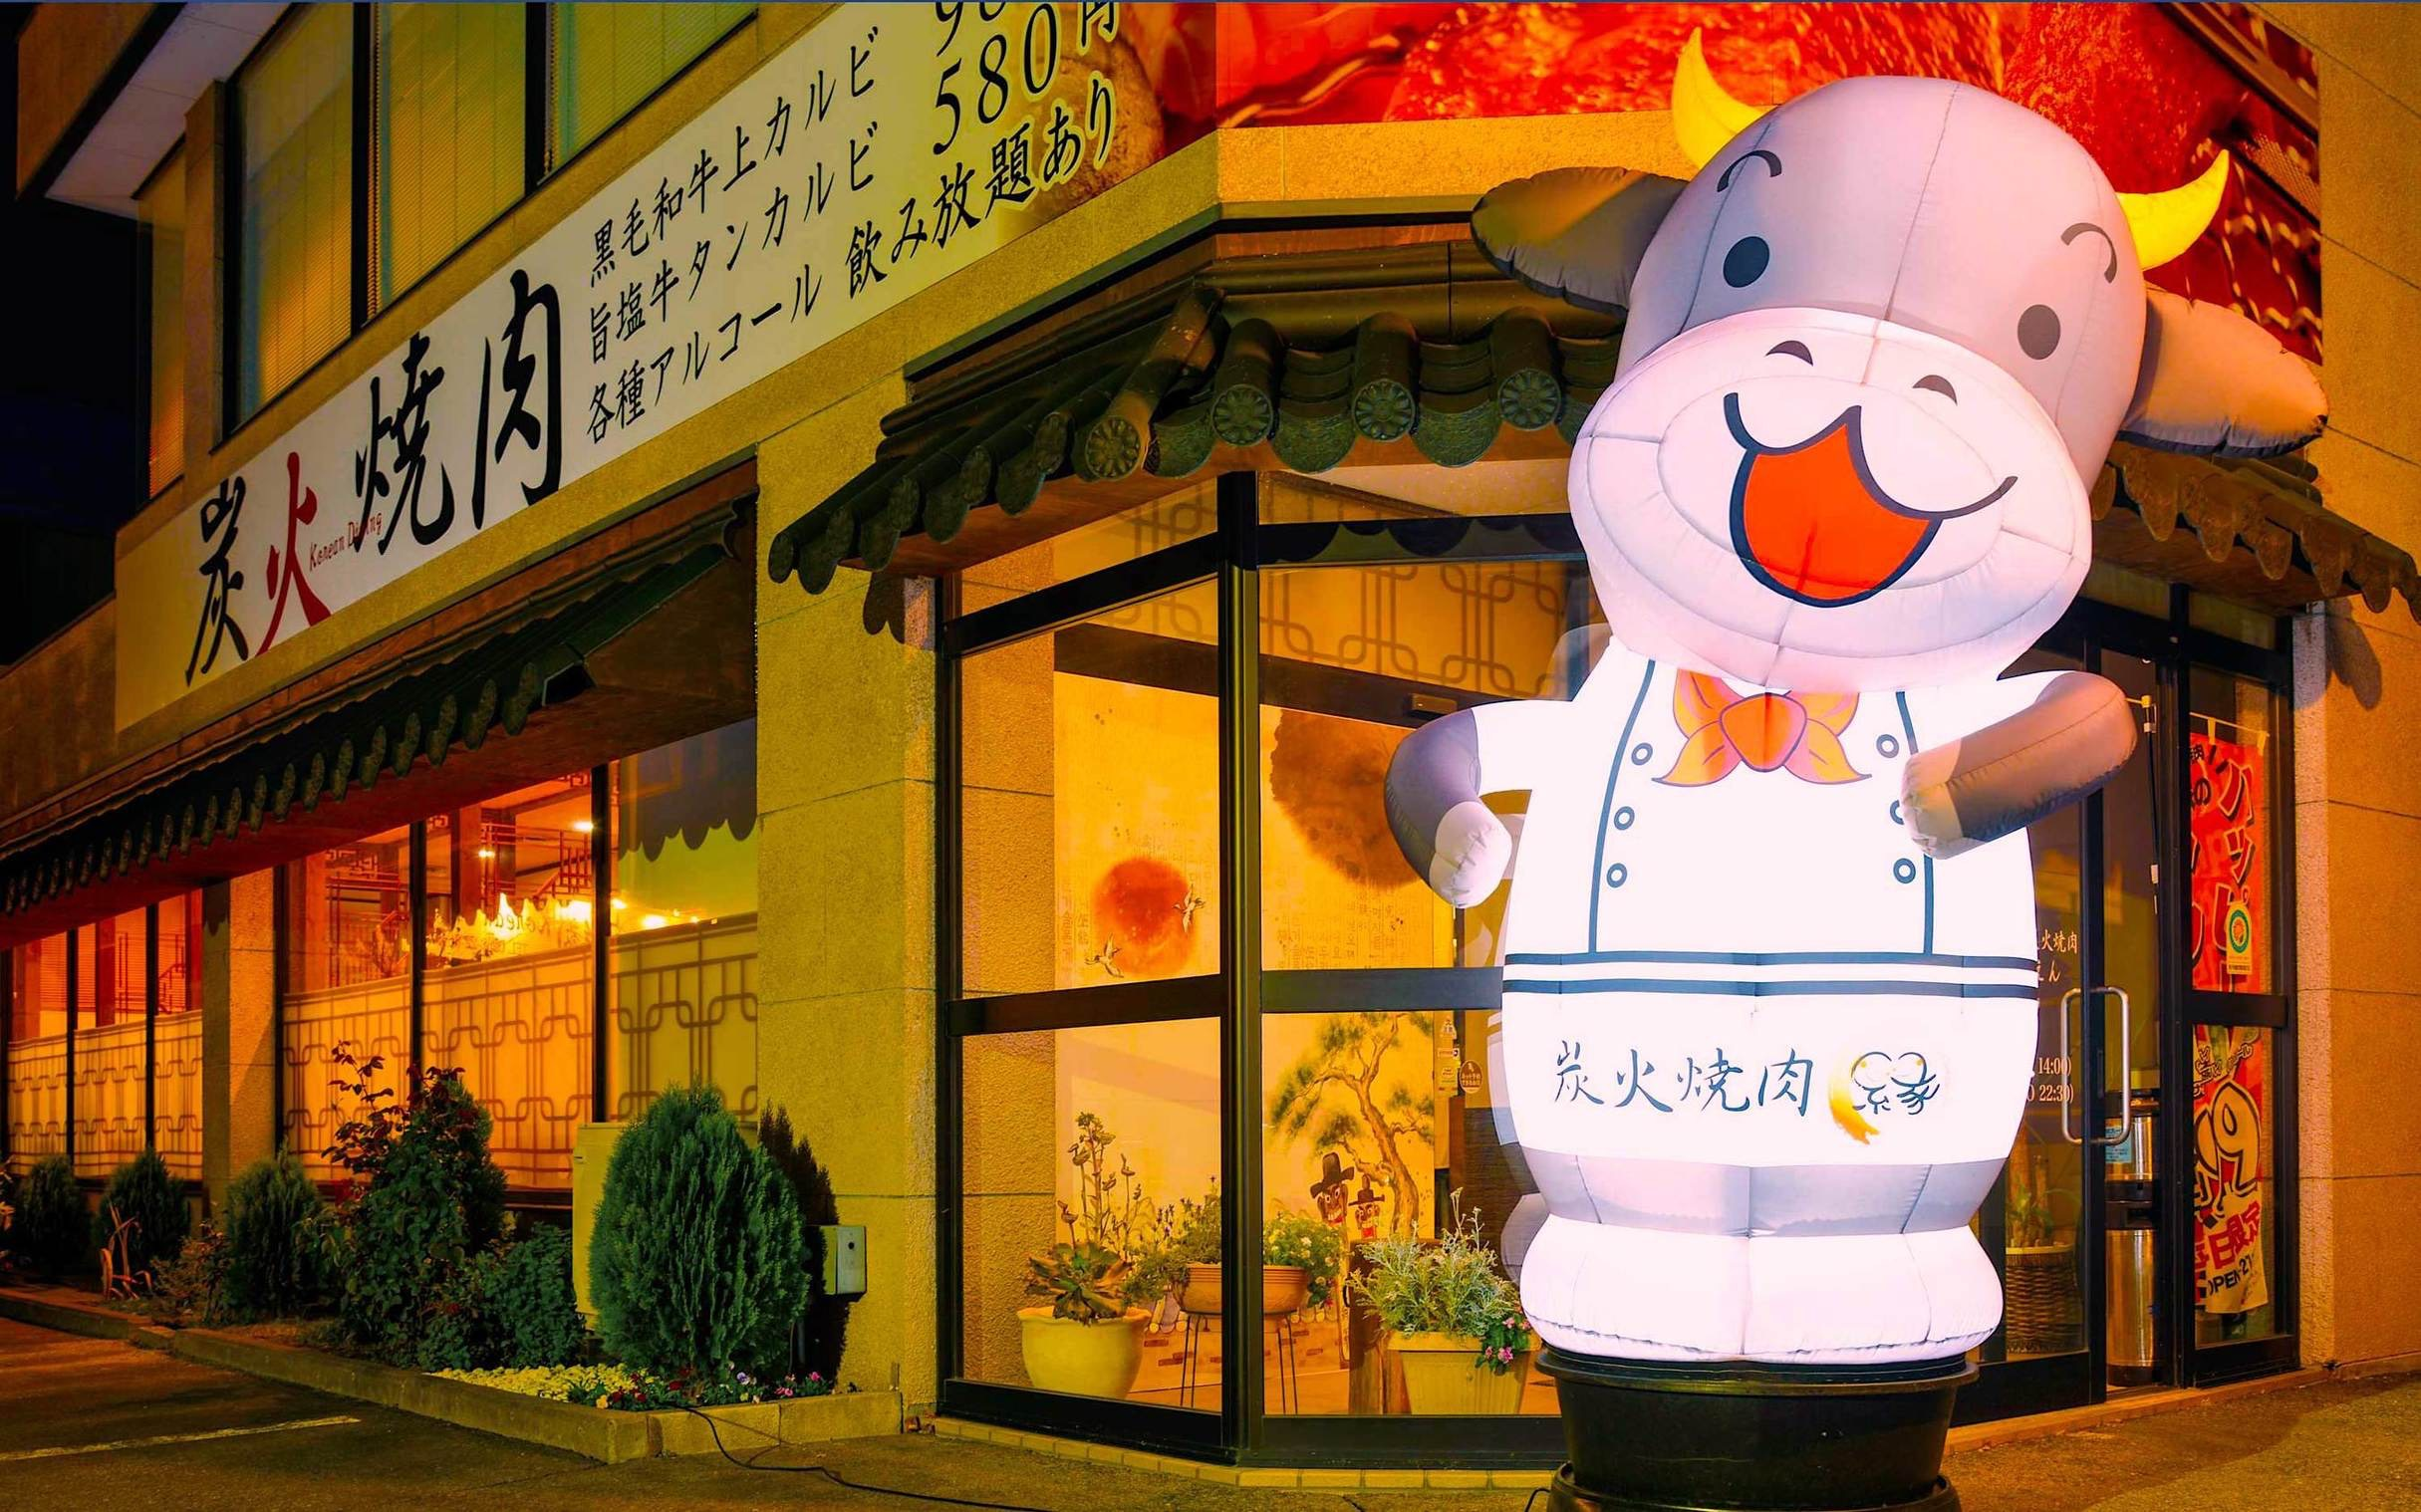 黒毛和牛炭火焼肉と元祖信州冷麺 縁(えん)